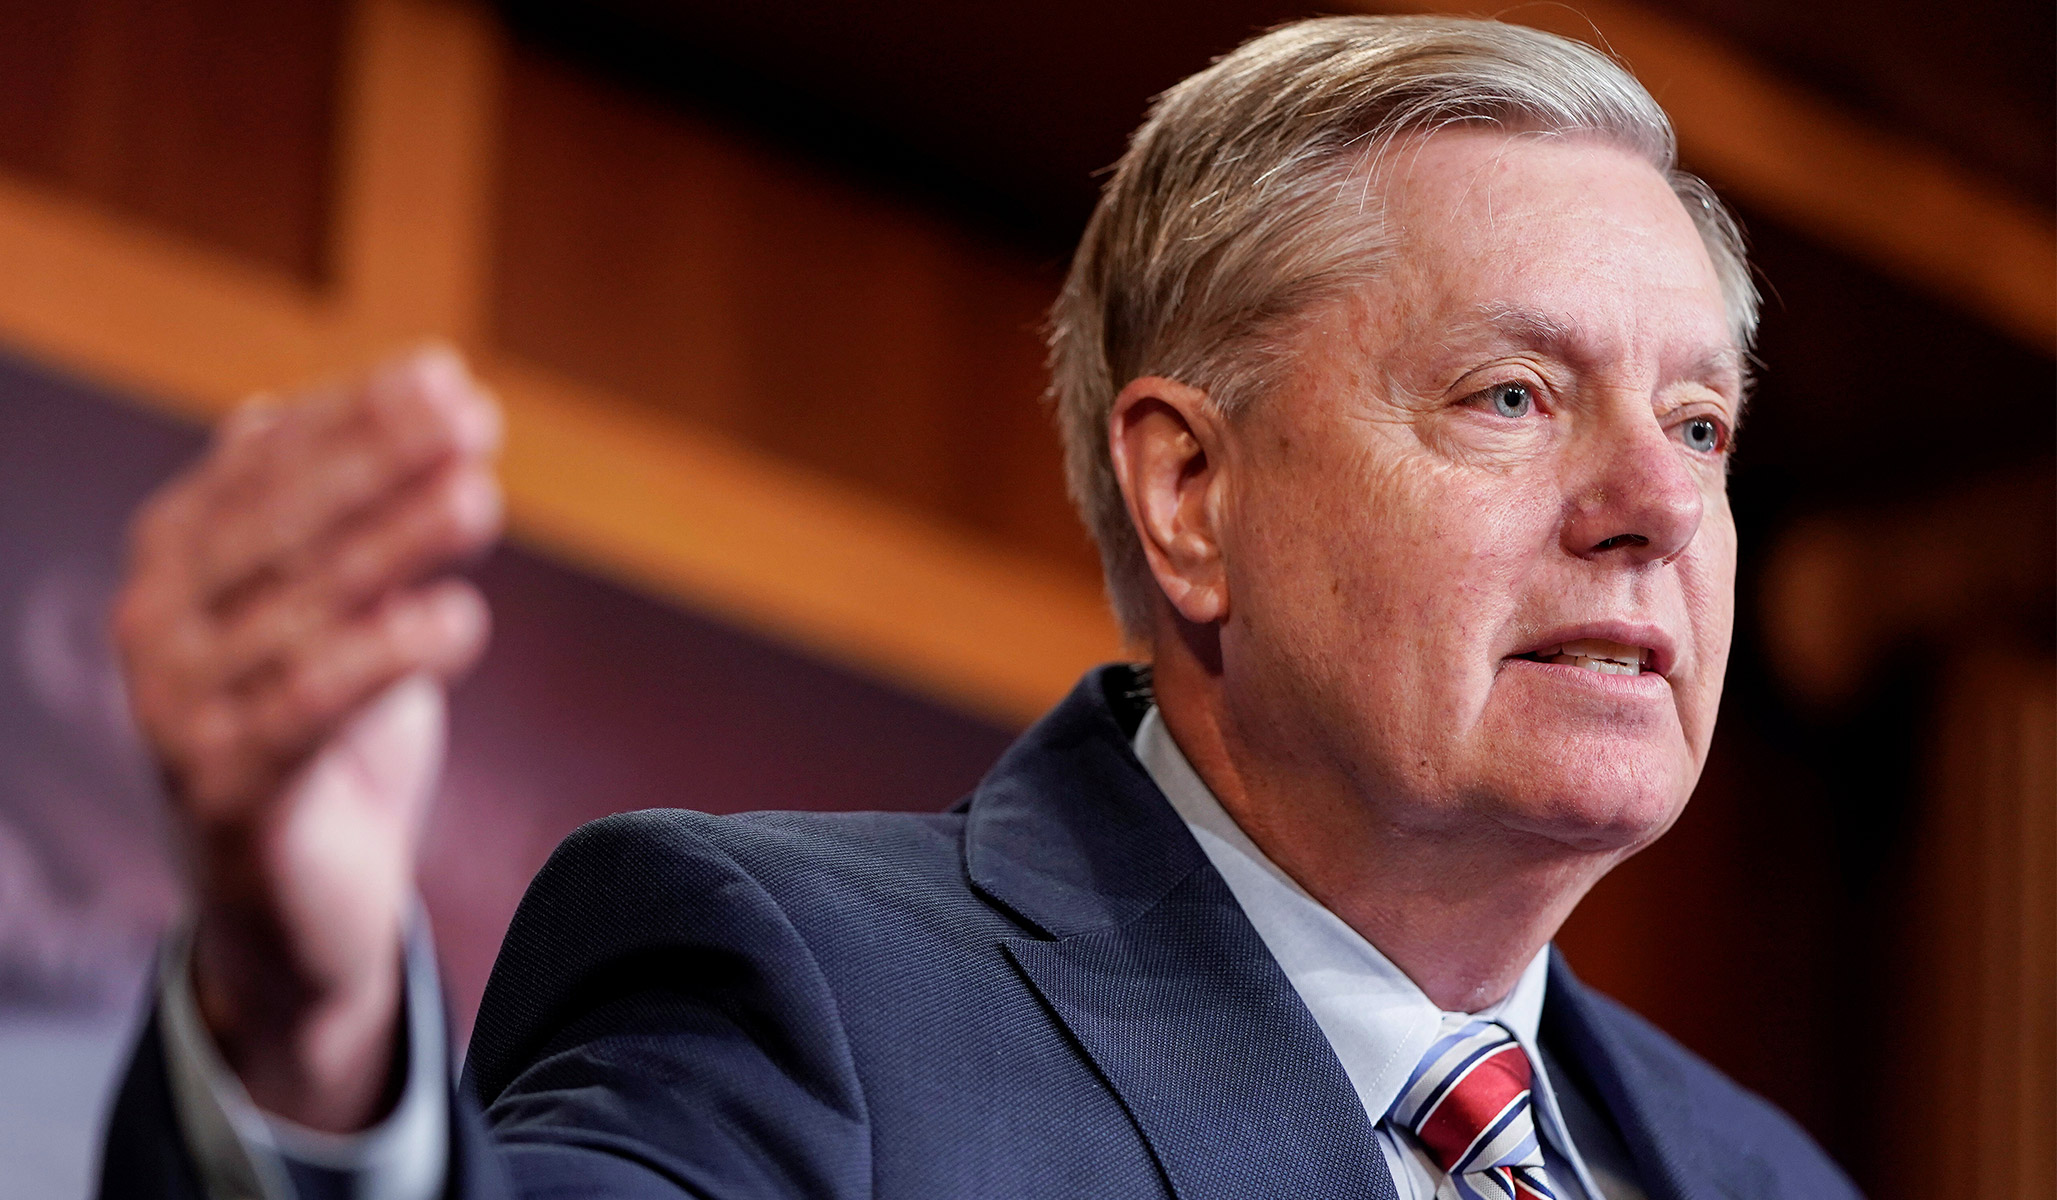 Lindsey Graham Says He Would Oppose Effort to Compel Hunter Biden Testimony